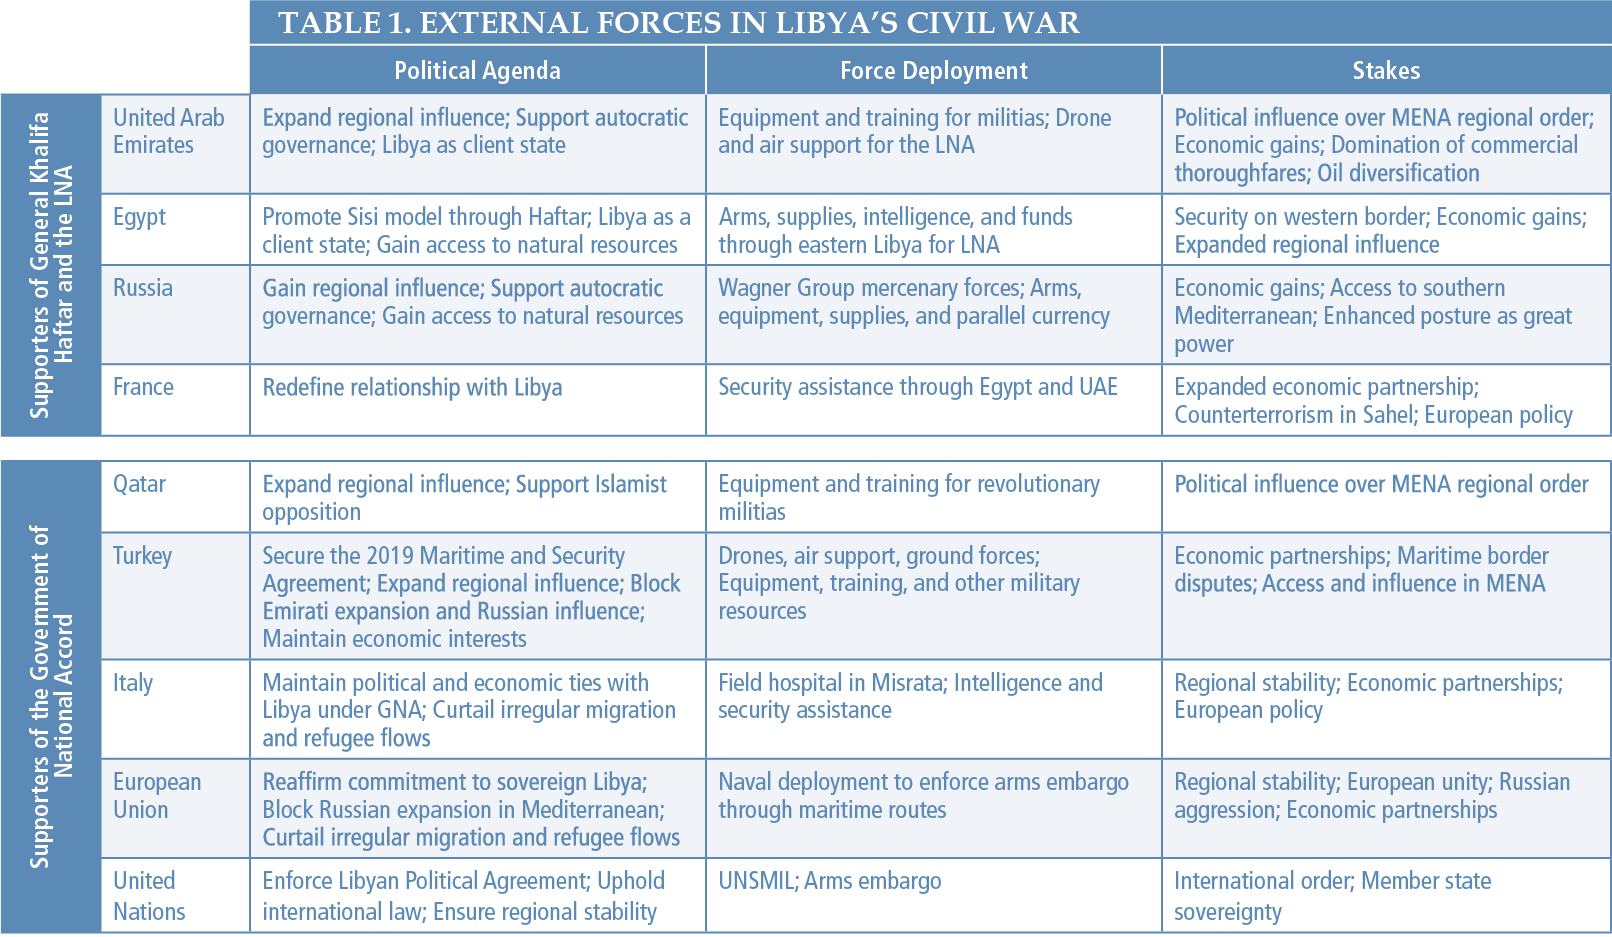 Table 1 - External Forces in Libya's Civil War